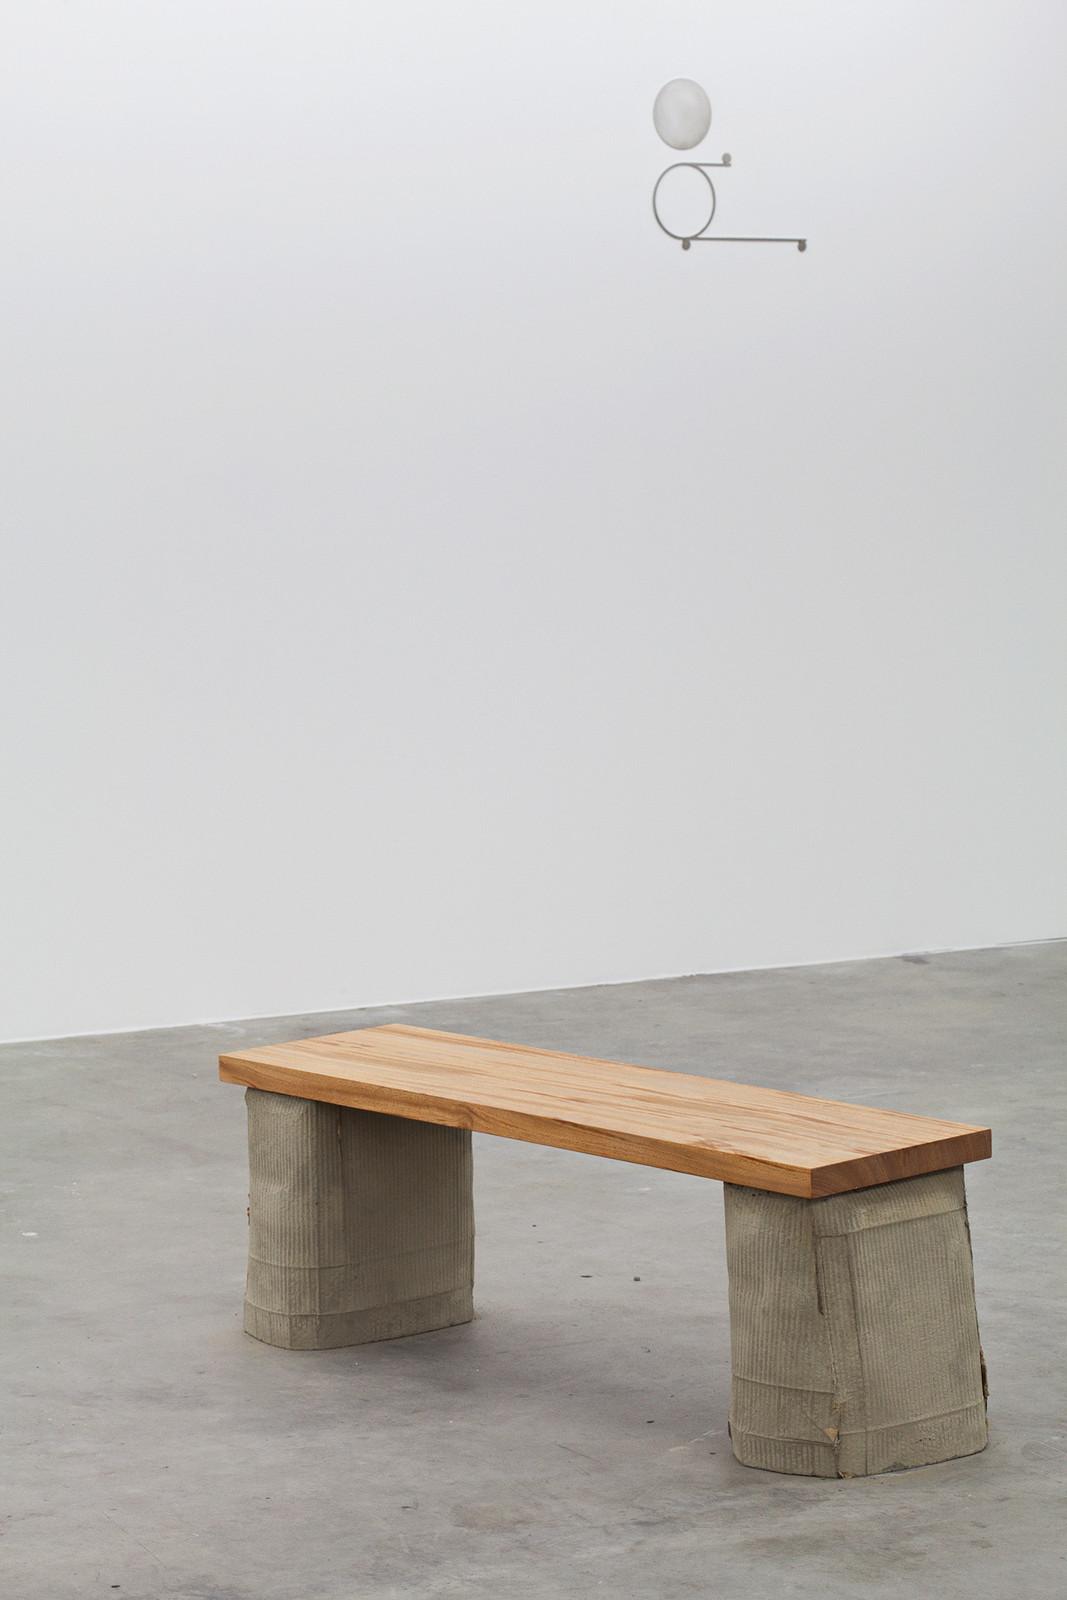 Exhibition-view-002